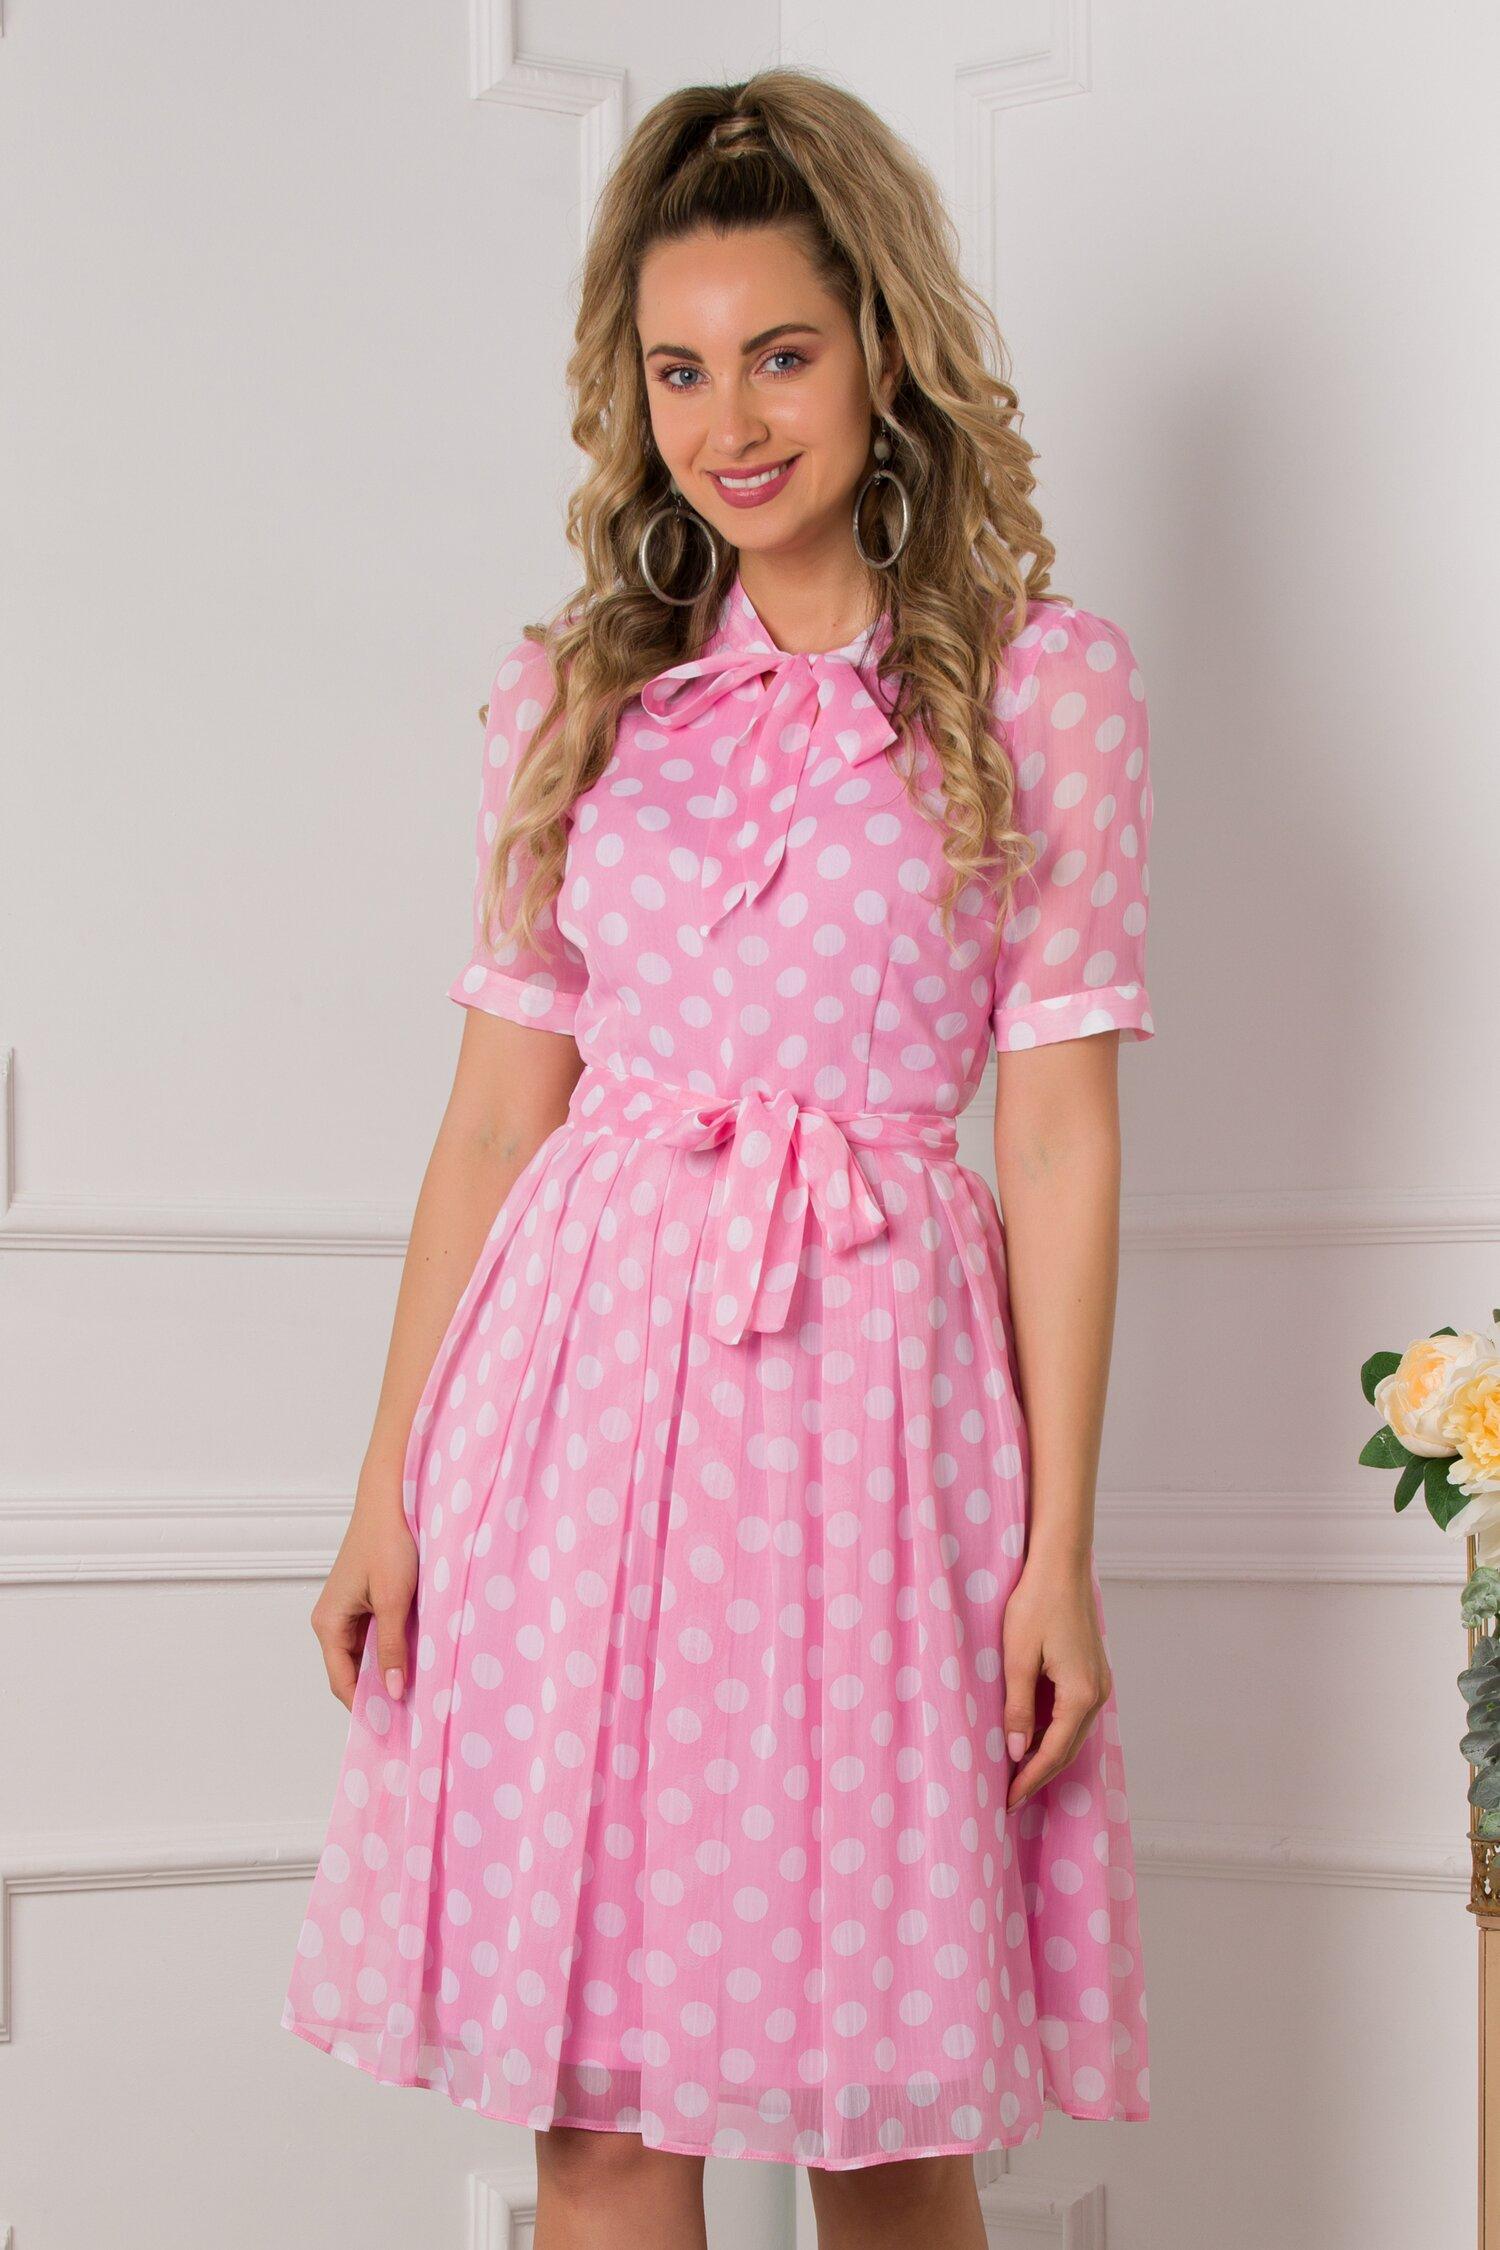 Rochie Valerie roz vaporoasa cu buline albe imprimate